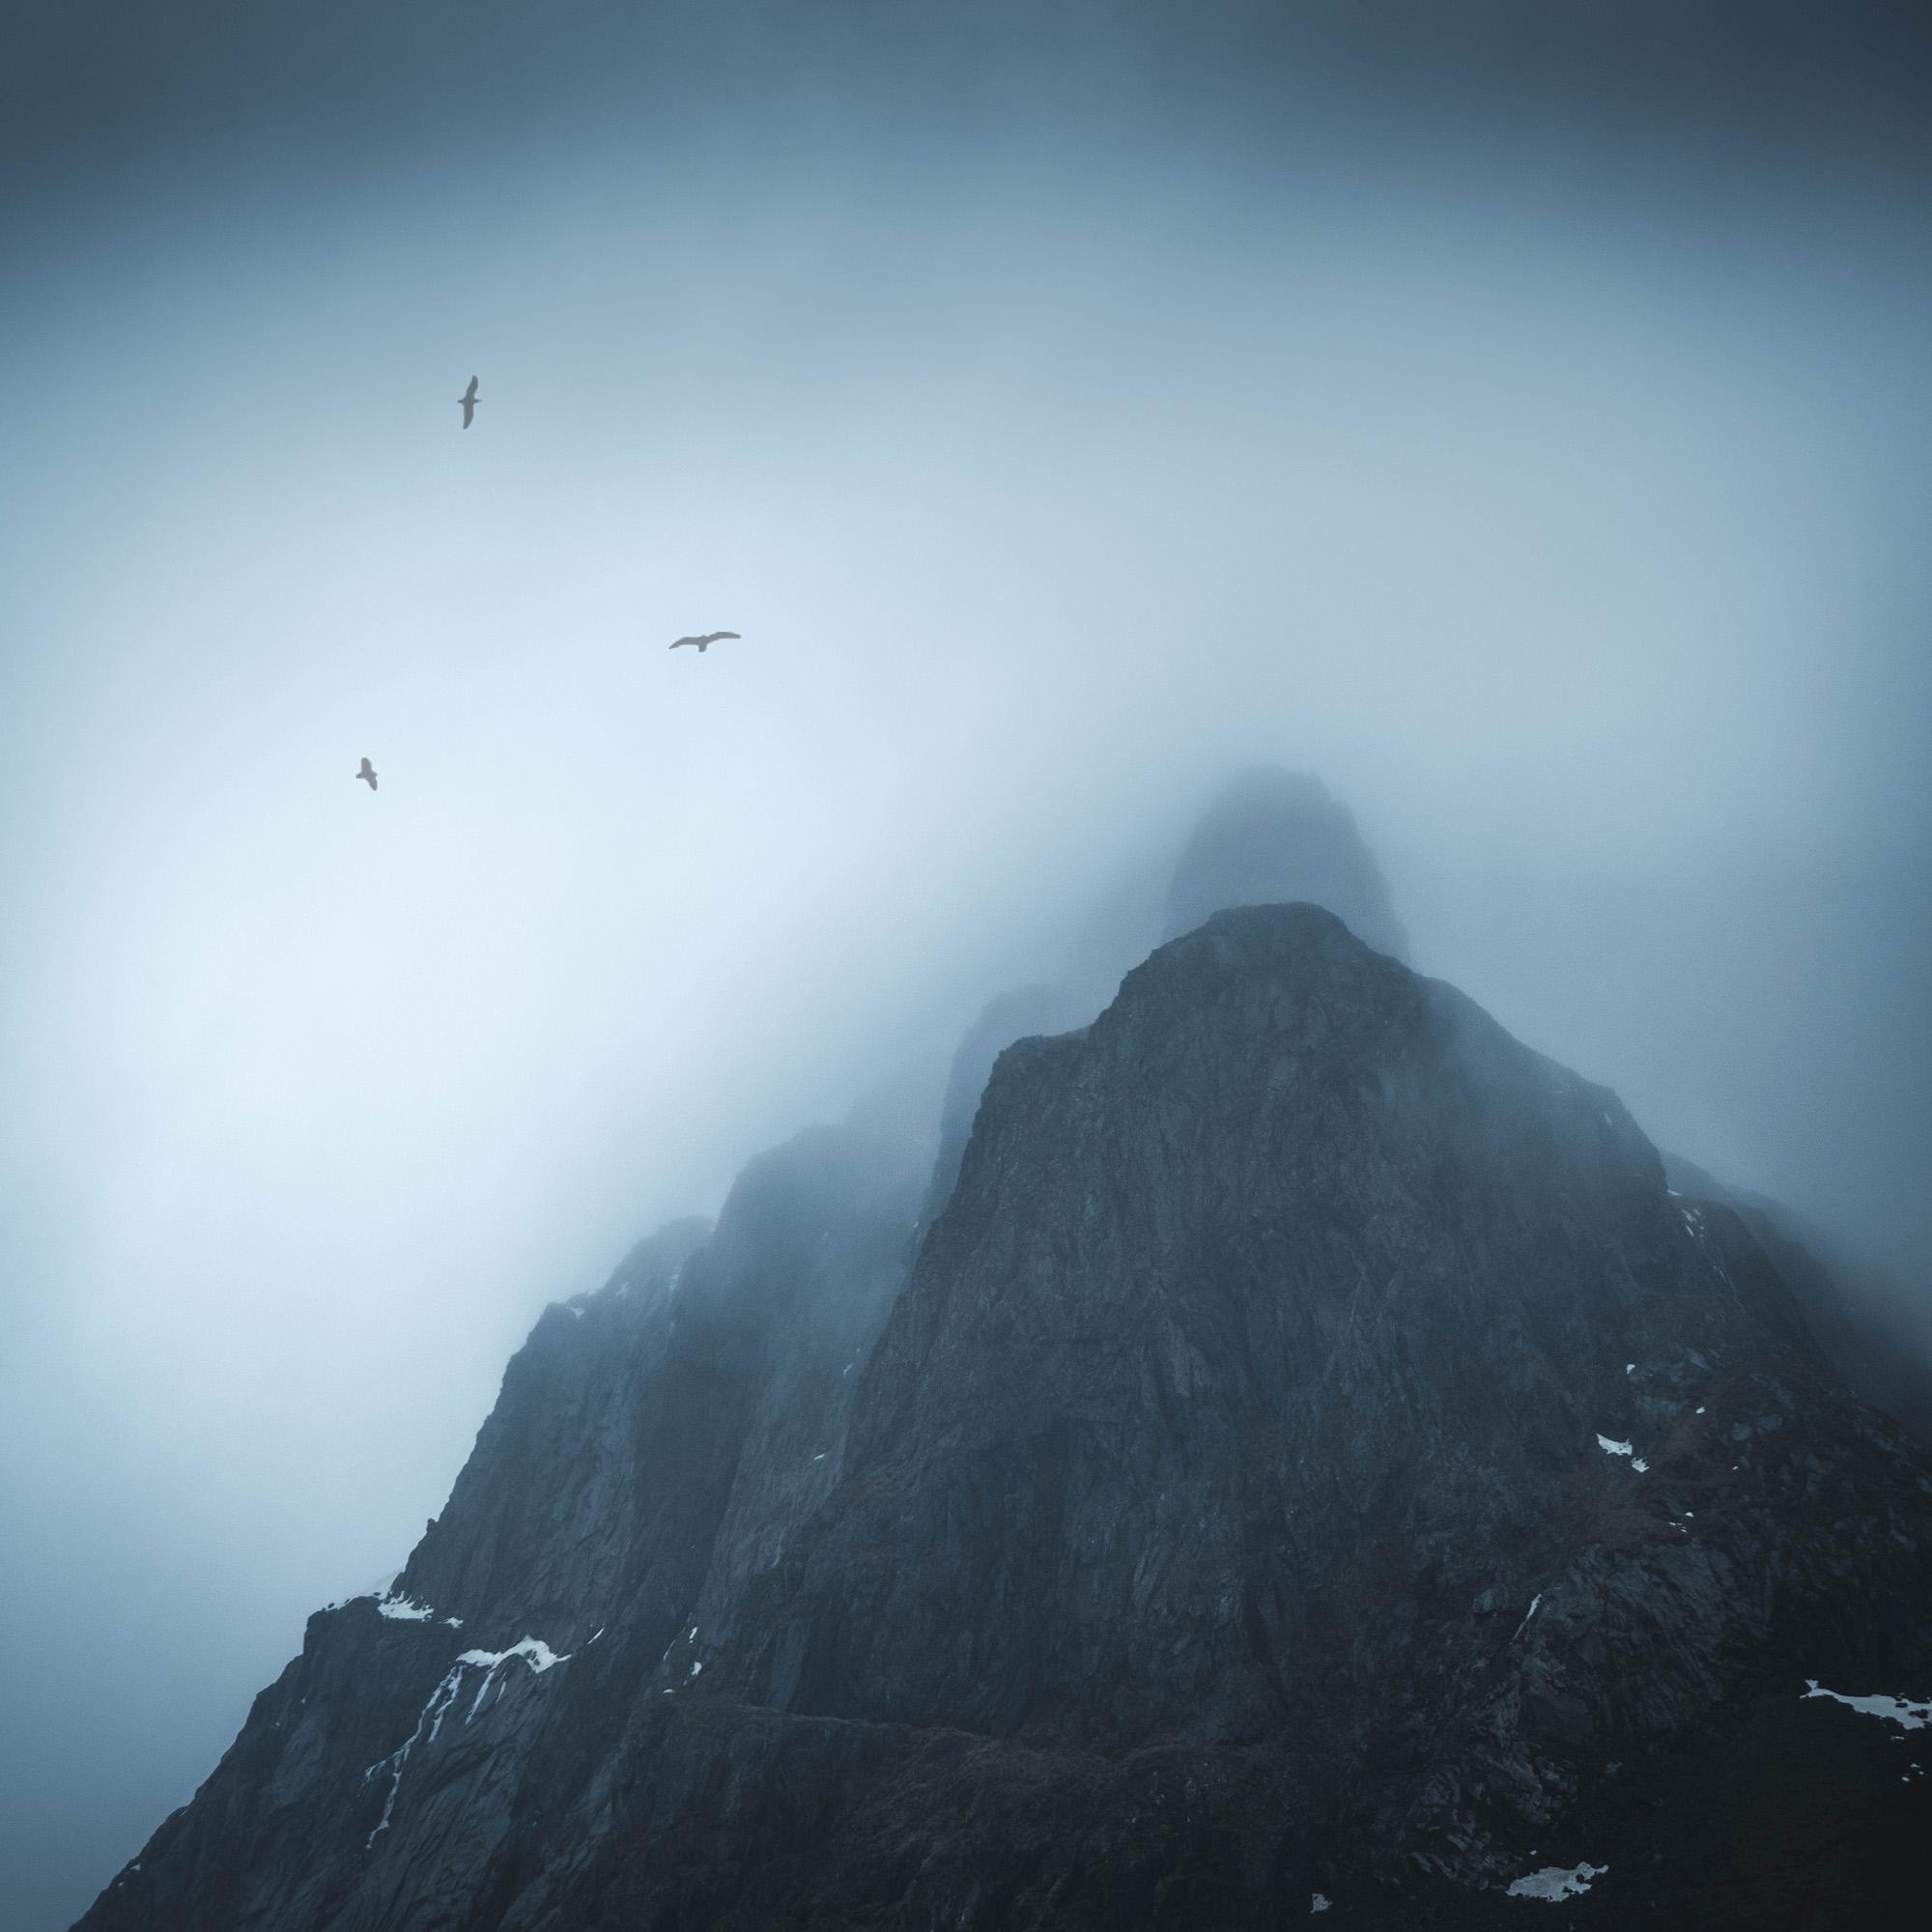 Lofoten Mountains   Low lying cloud surrounds the granite peaks in the Lofoten Island